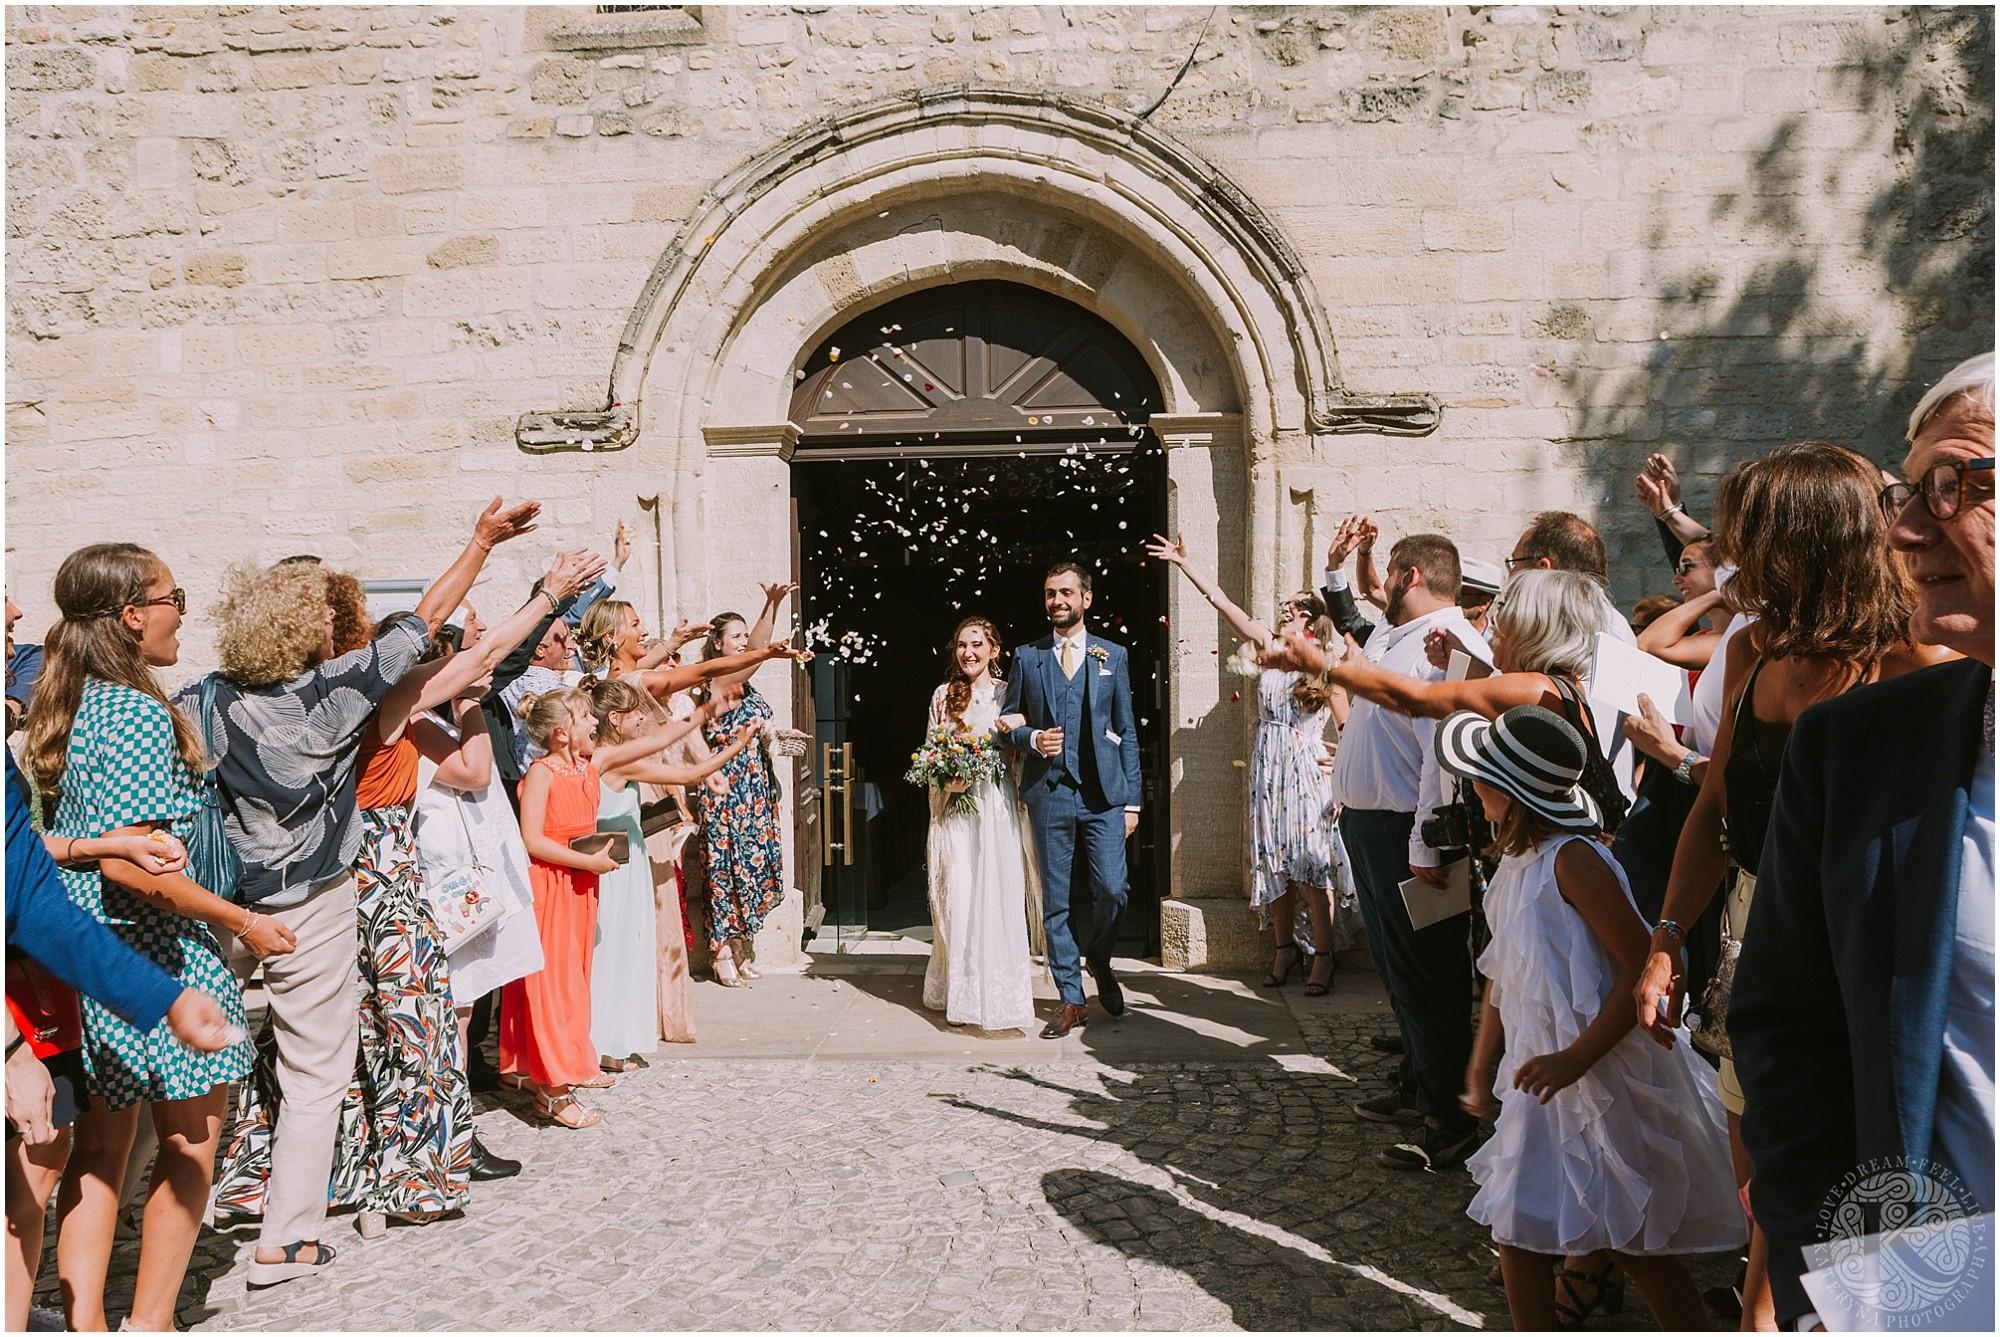 Kateryna-photos-photographe-mariage-vaucluse-provence-avignon-ferme-st-hugues_0035.jpg